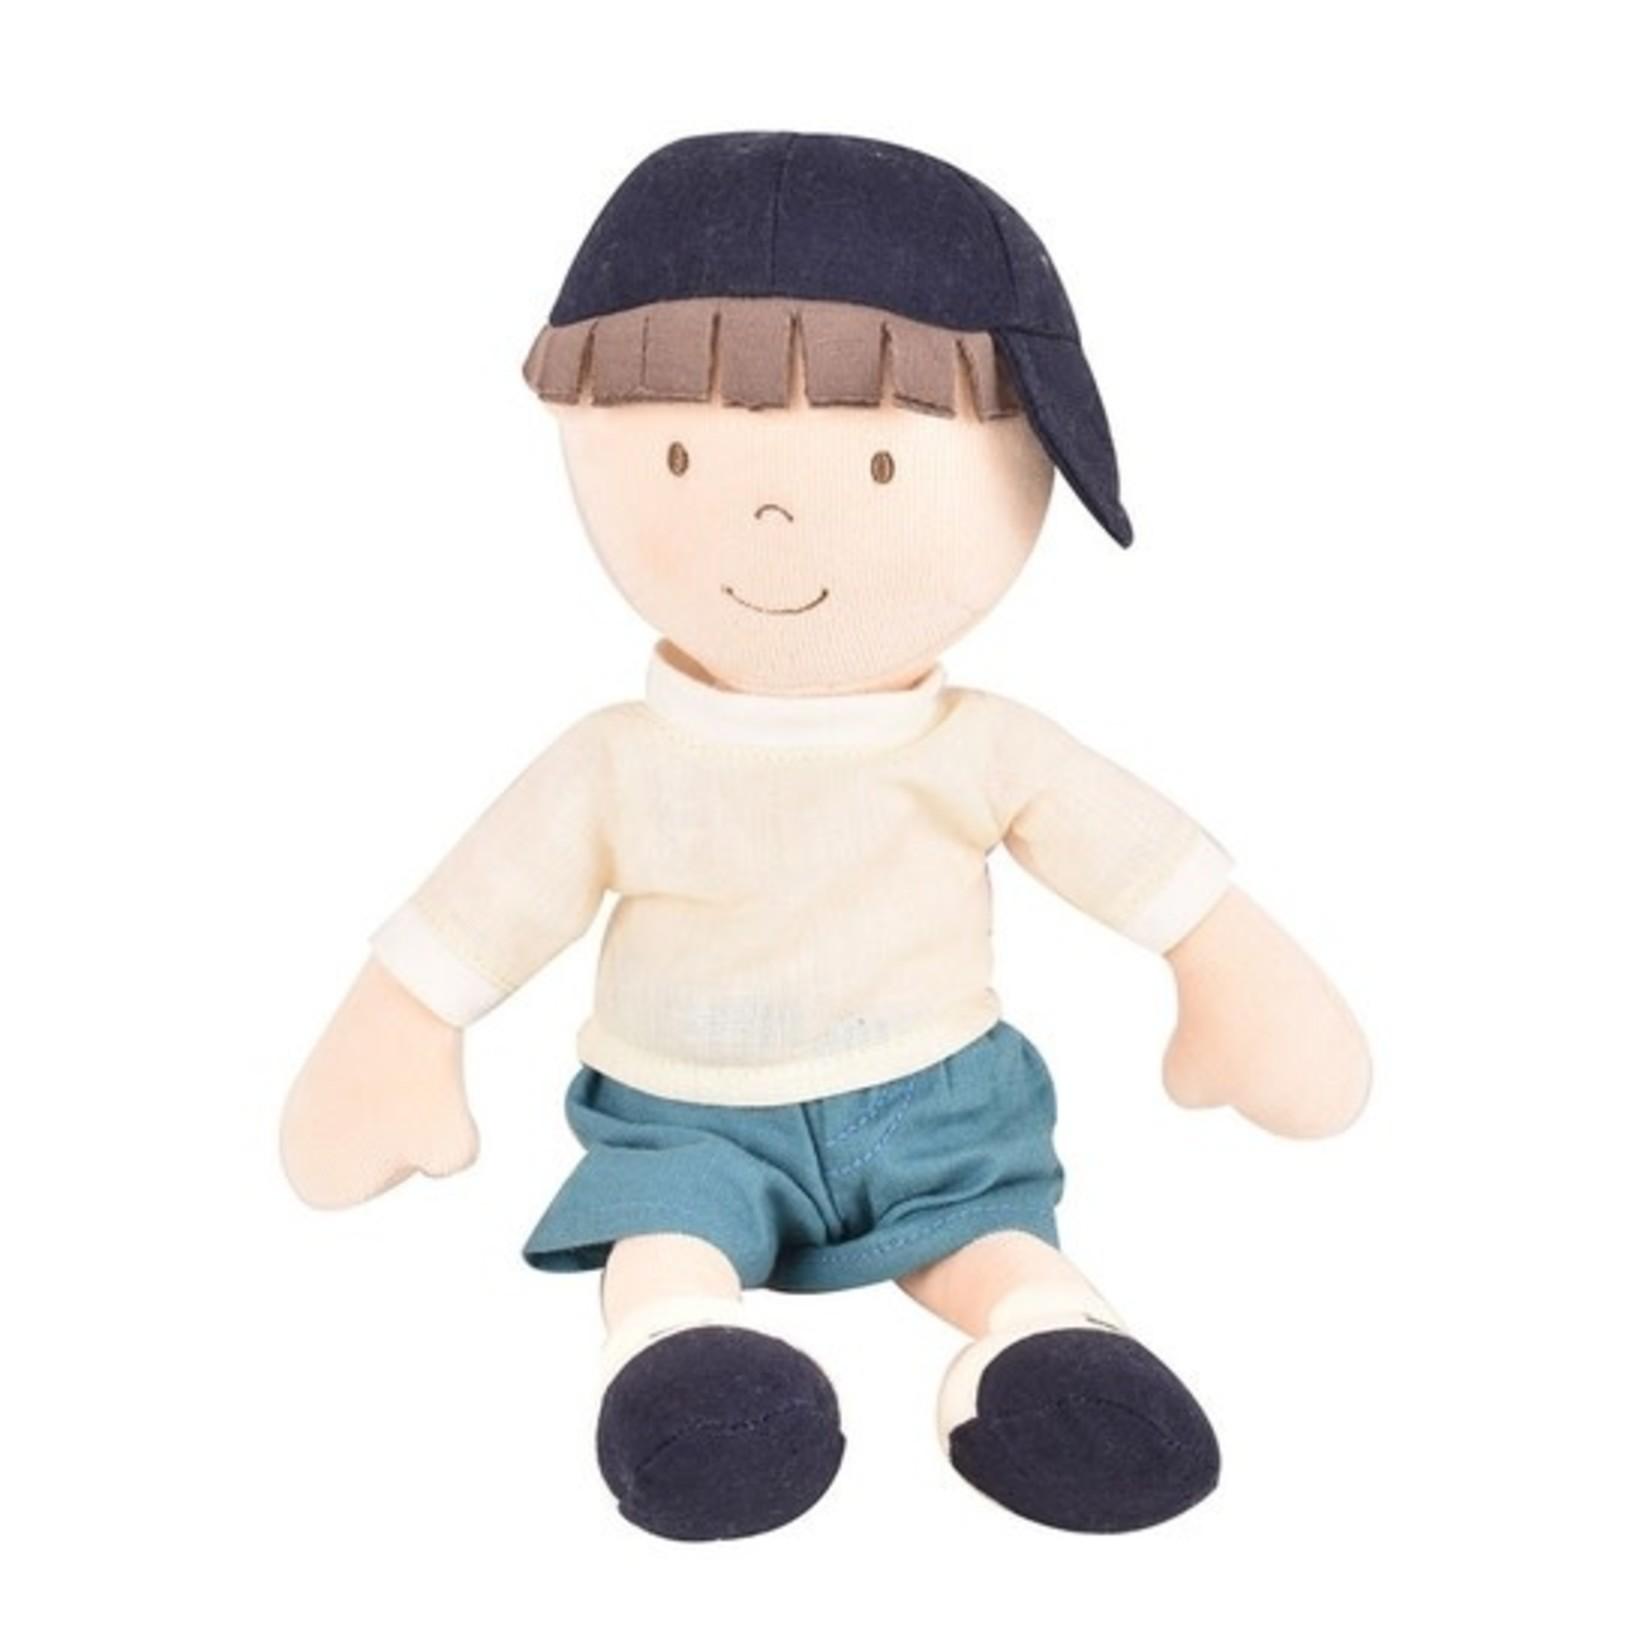 Tikiri Toys Jasper - Boy Doll in Blue Shorts